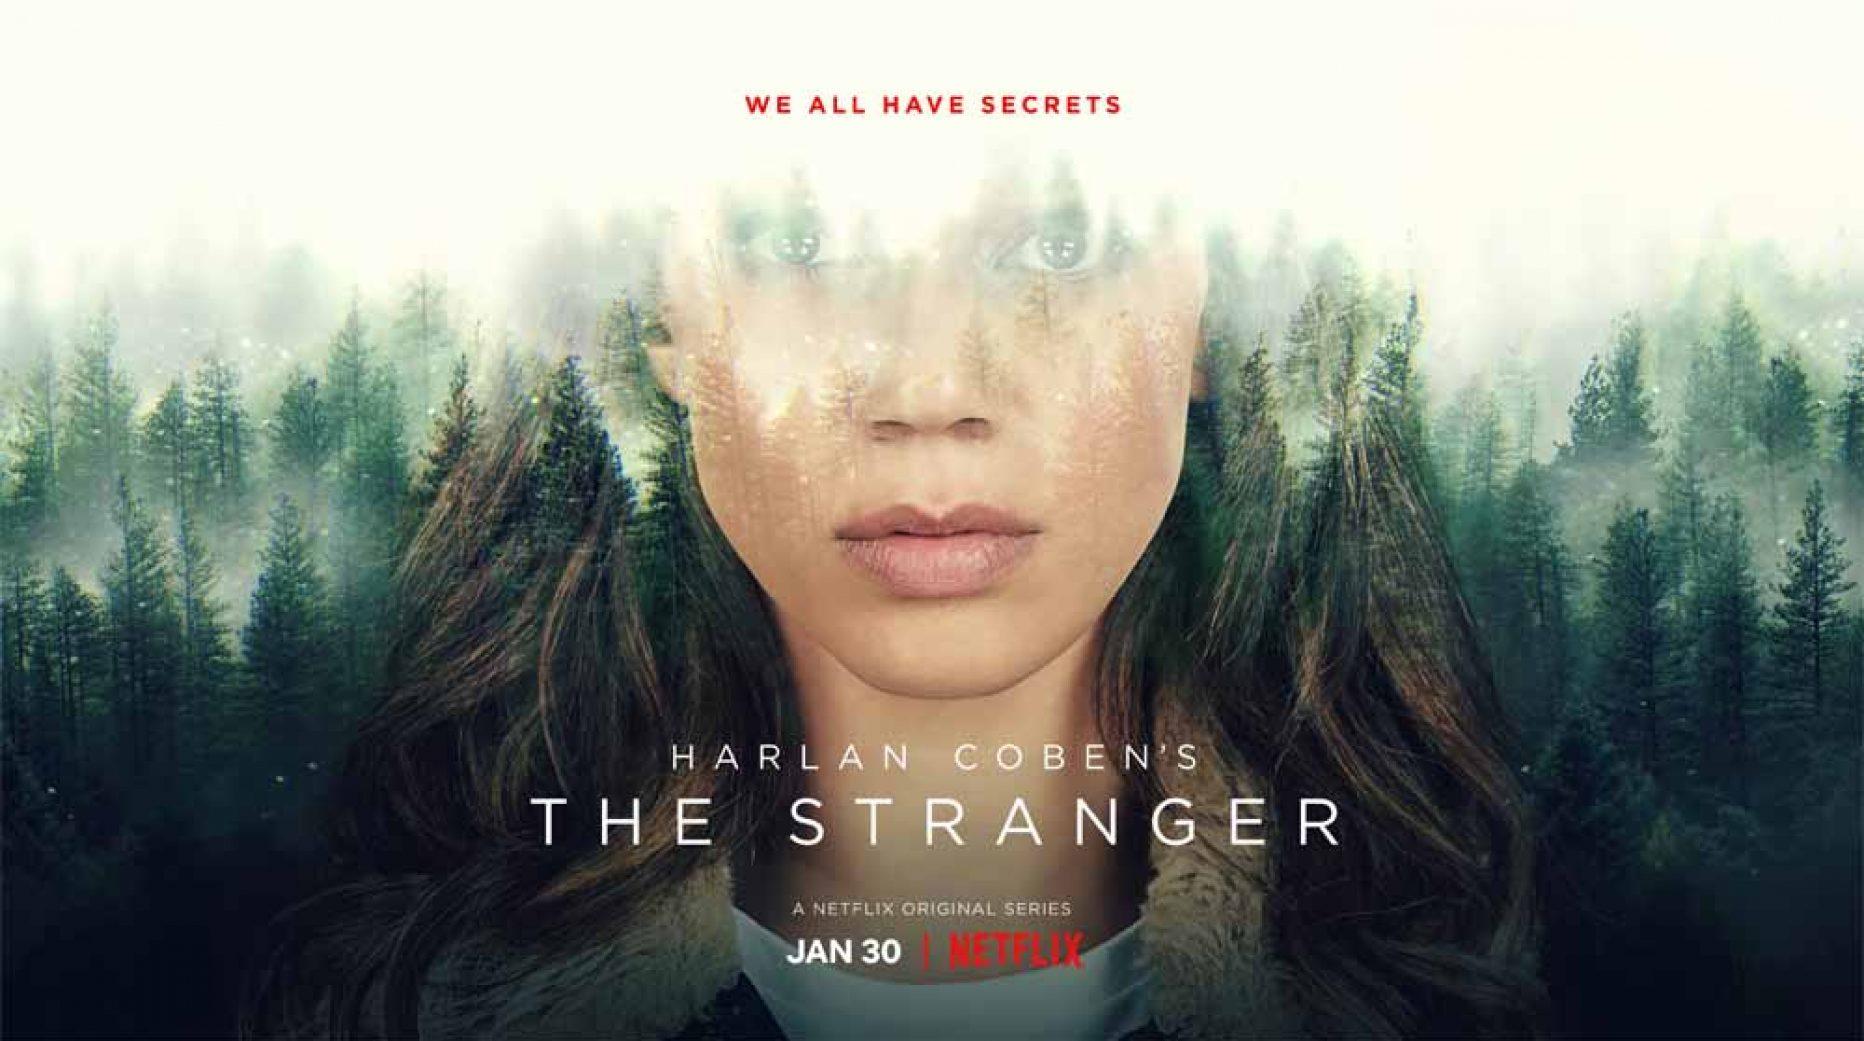 Netflix Series The Stranger Review, Plot, Story, Cast, Release Date